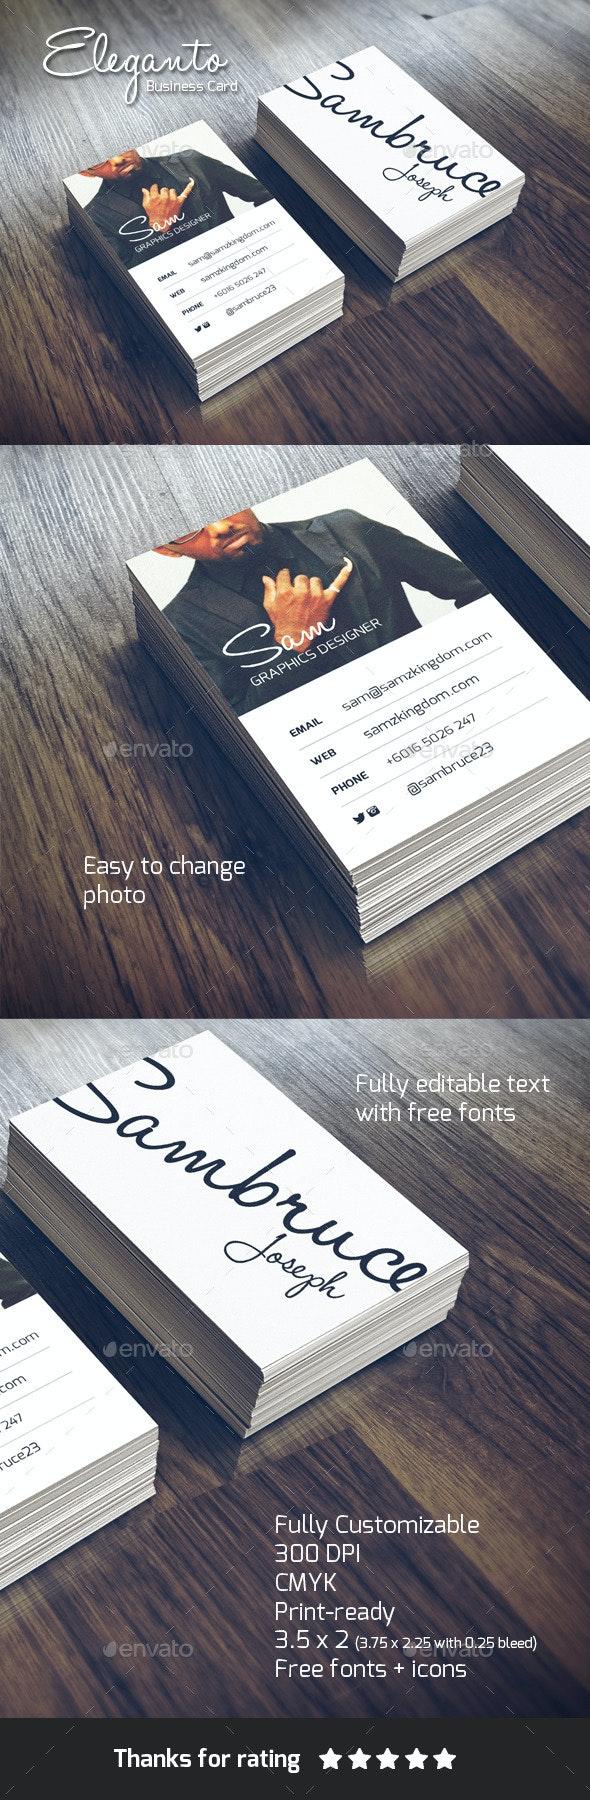 Eleganto Business Card - Business Cards Print Templates